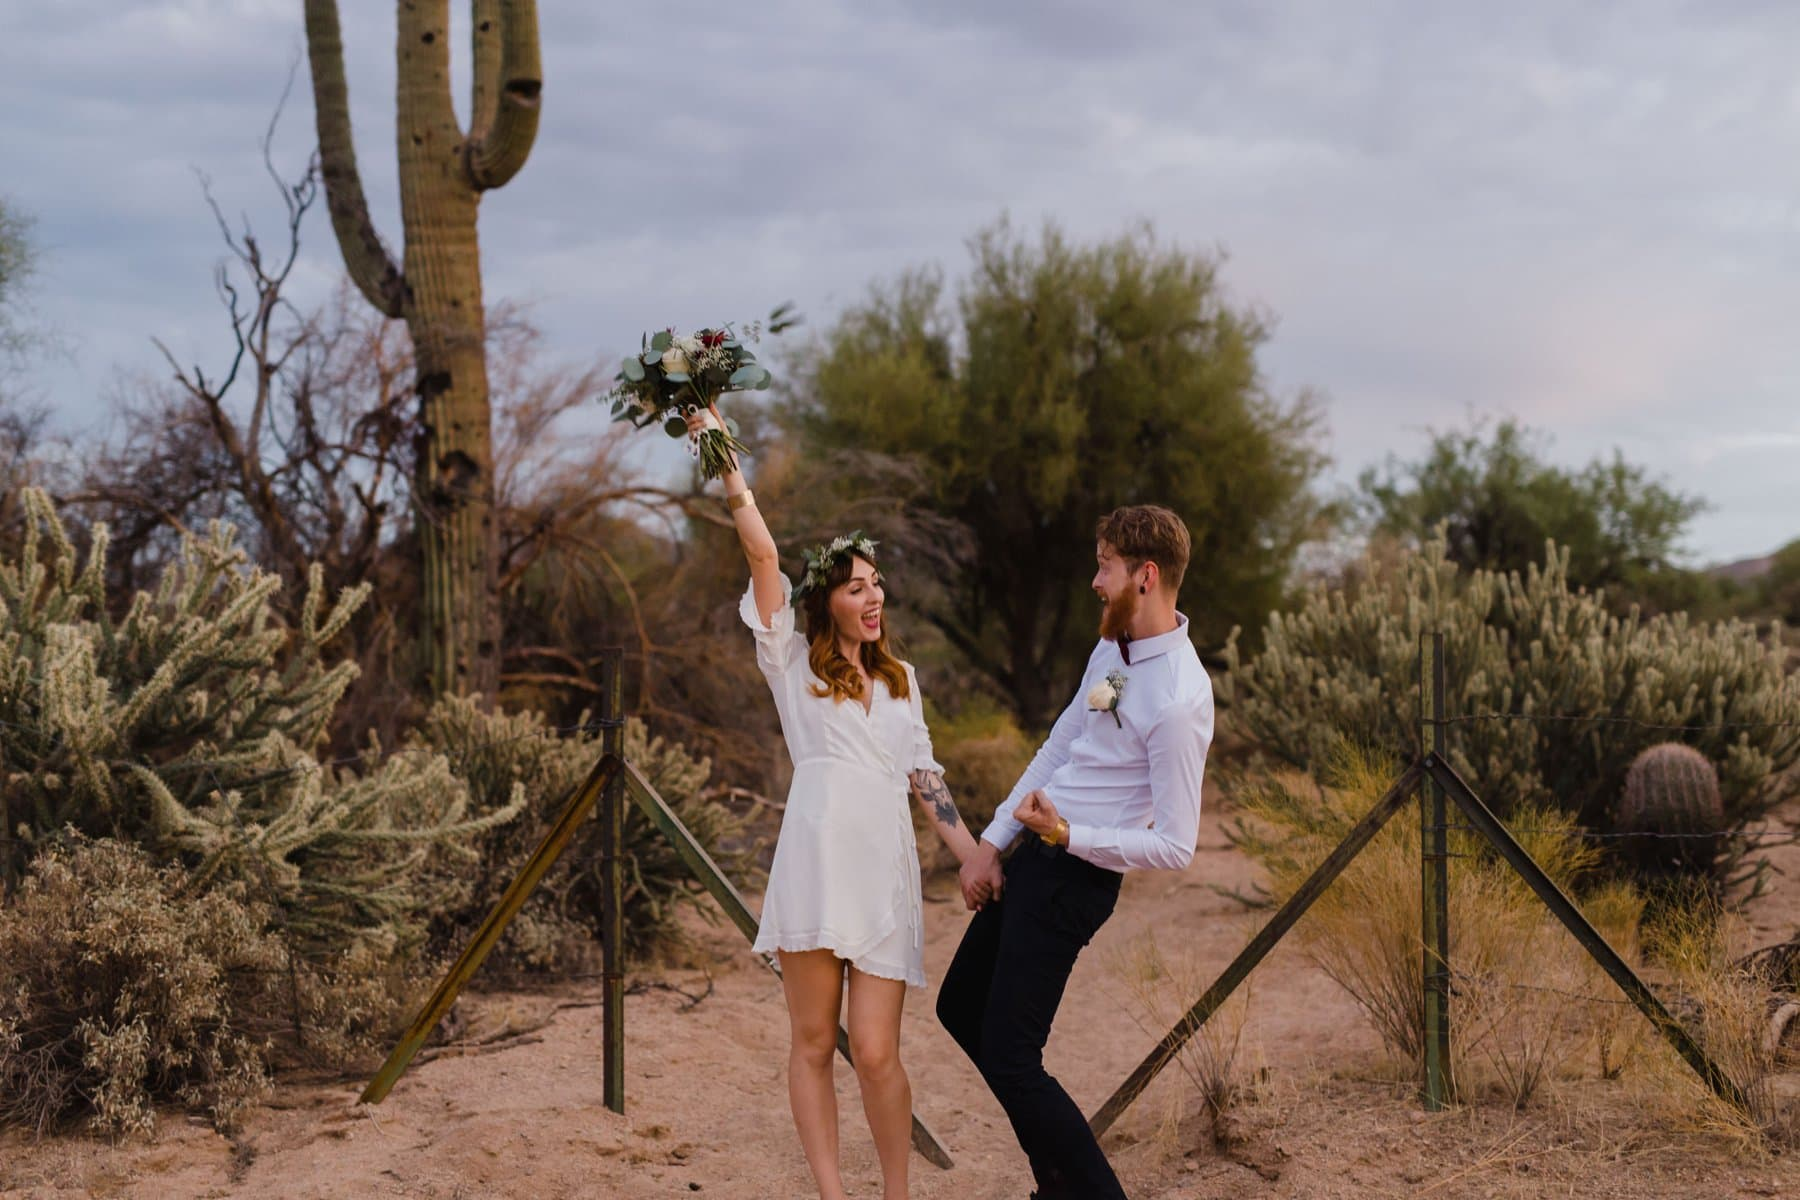 emotional candid natural elopement wedding photos in Arizona